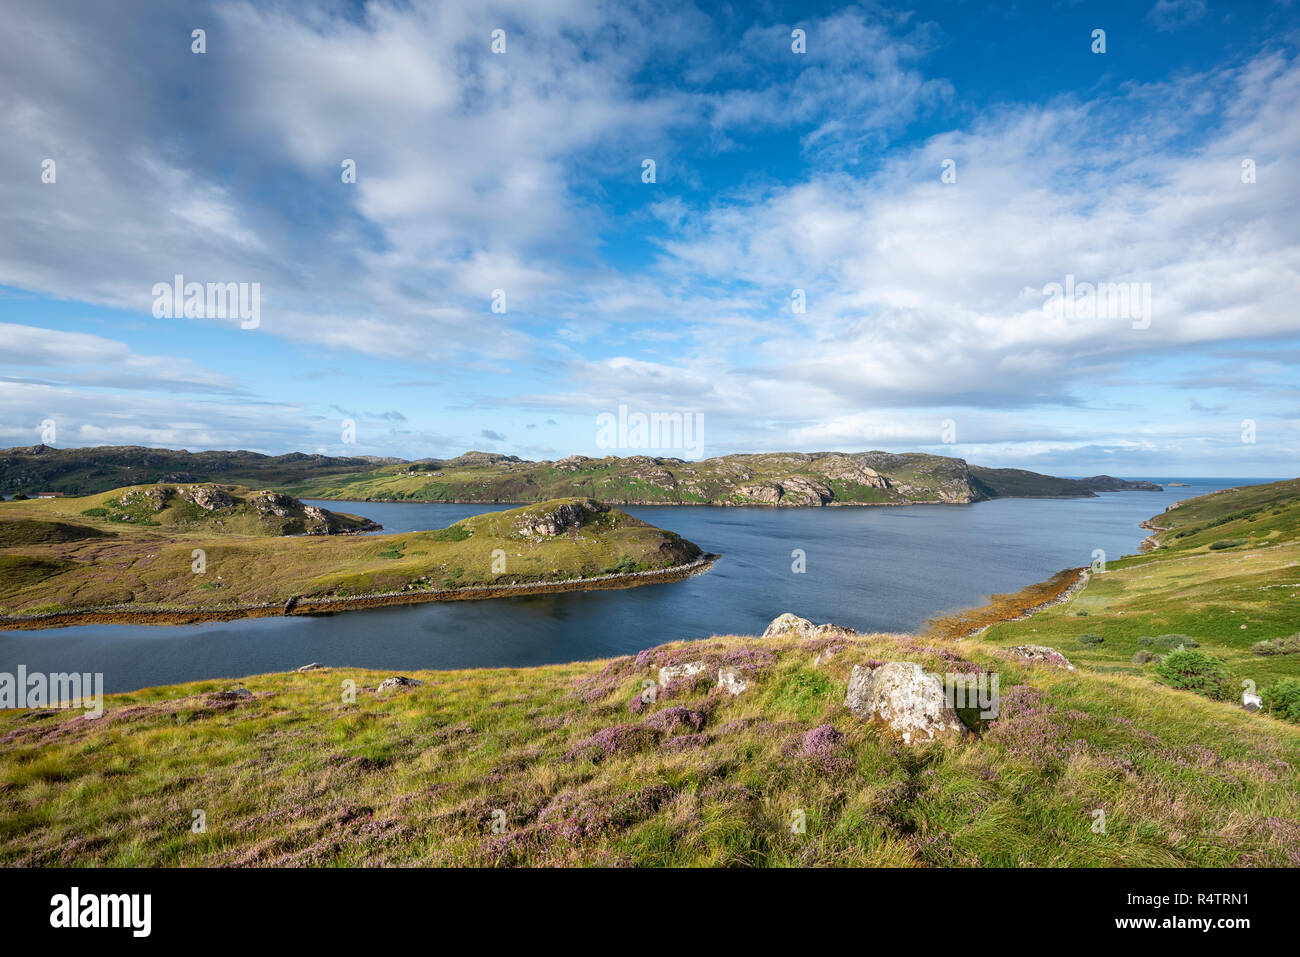 Vista sul mare ingresso Loch Inchard, Kinlochbervie, Caithness, Sutherland e Easter Ross, Scozia, Gran Bretagna Foto Stock